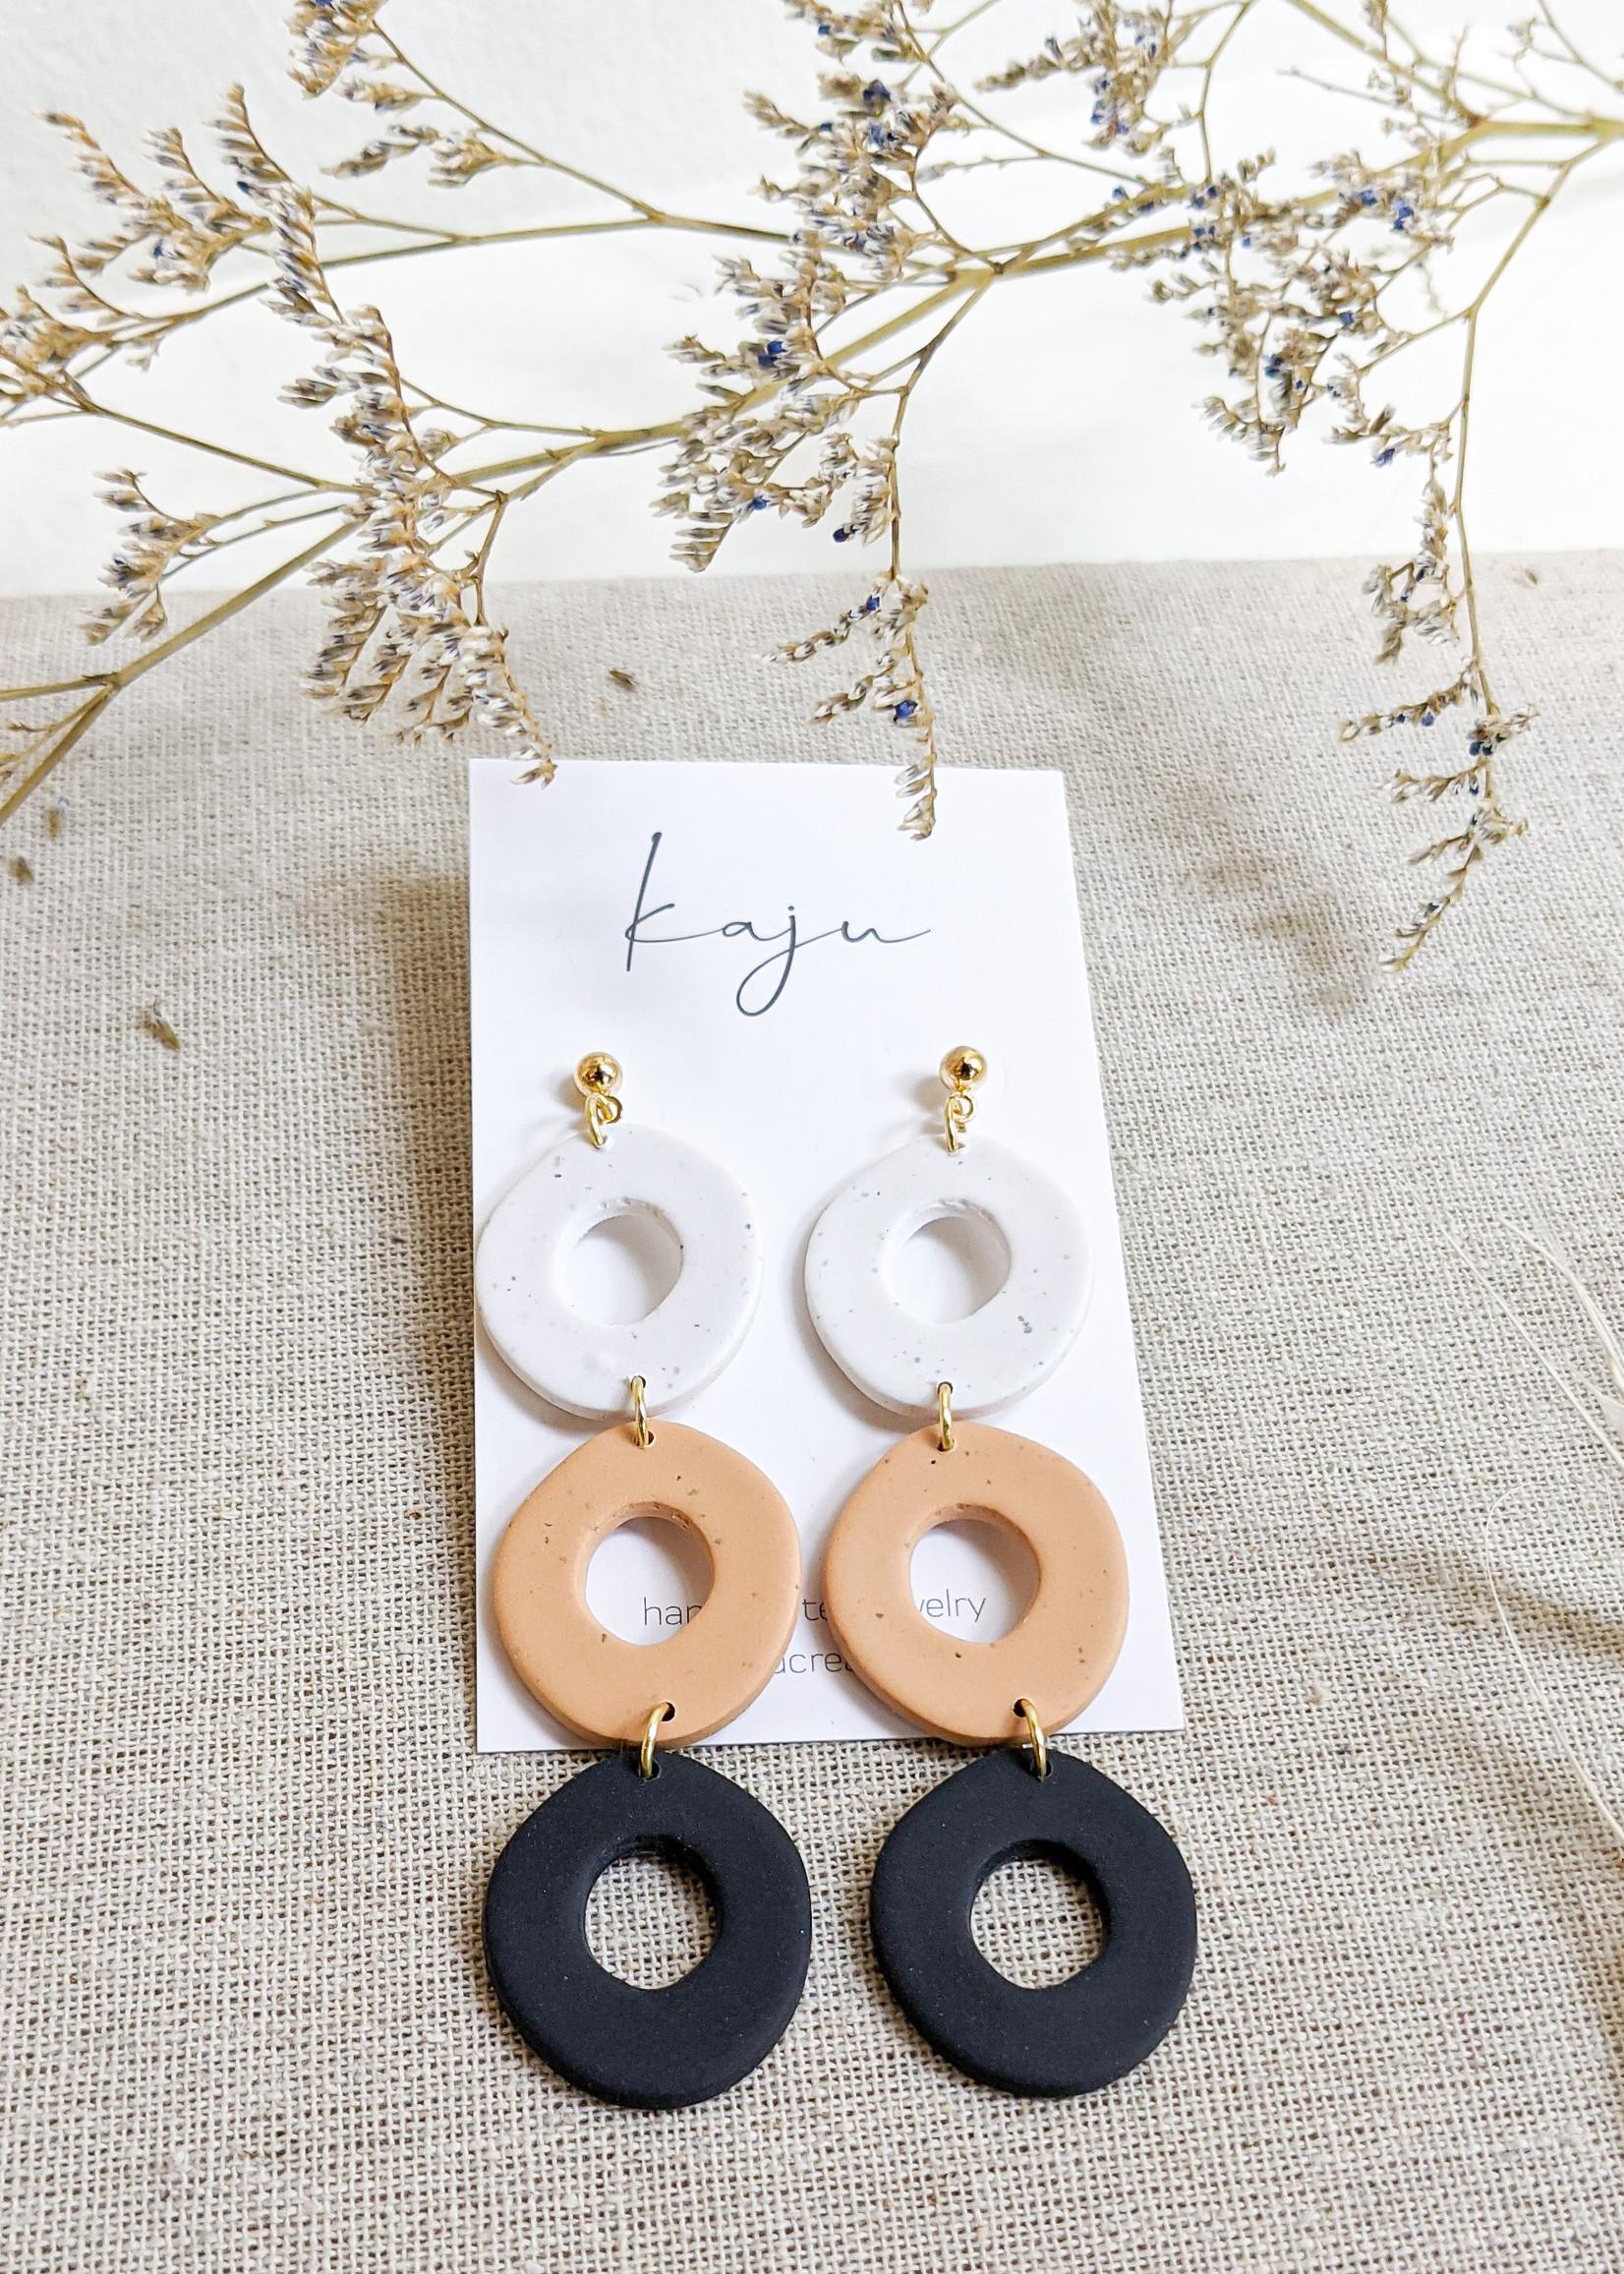 Kaju Jewerly Creations Kaju - Dina Earrings - Desert/Black